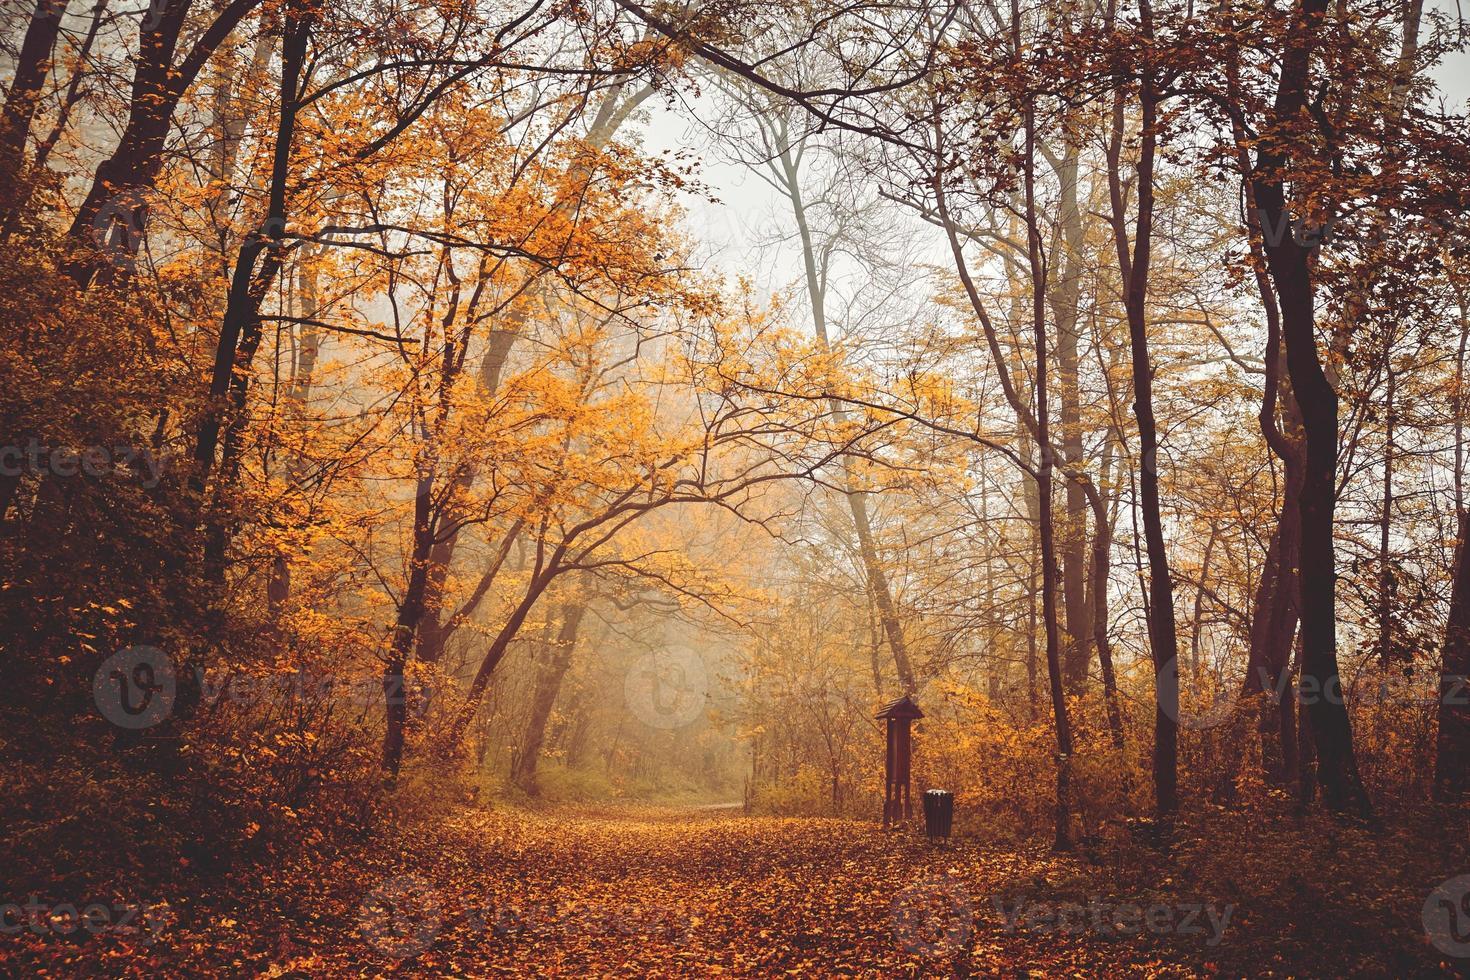 camino forestal de otoño foto